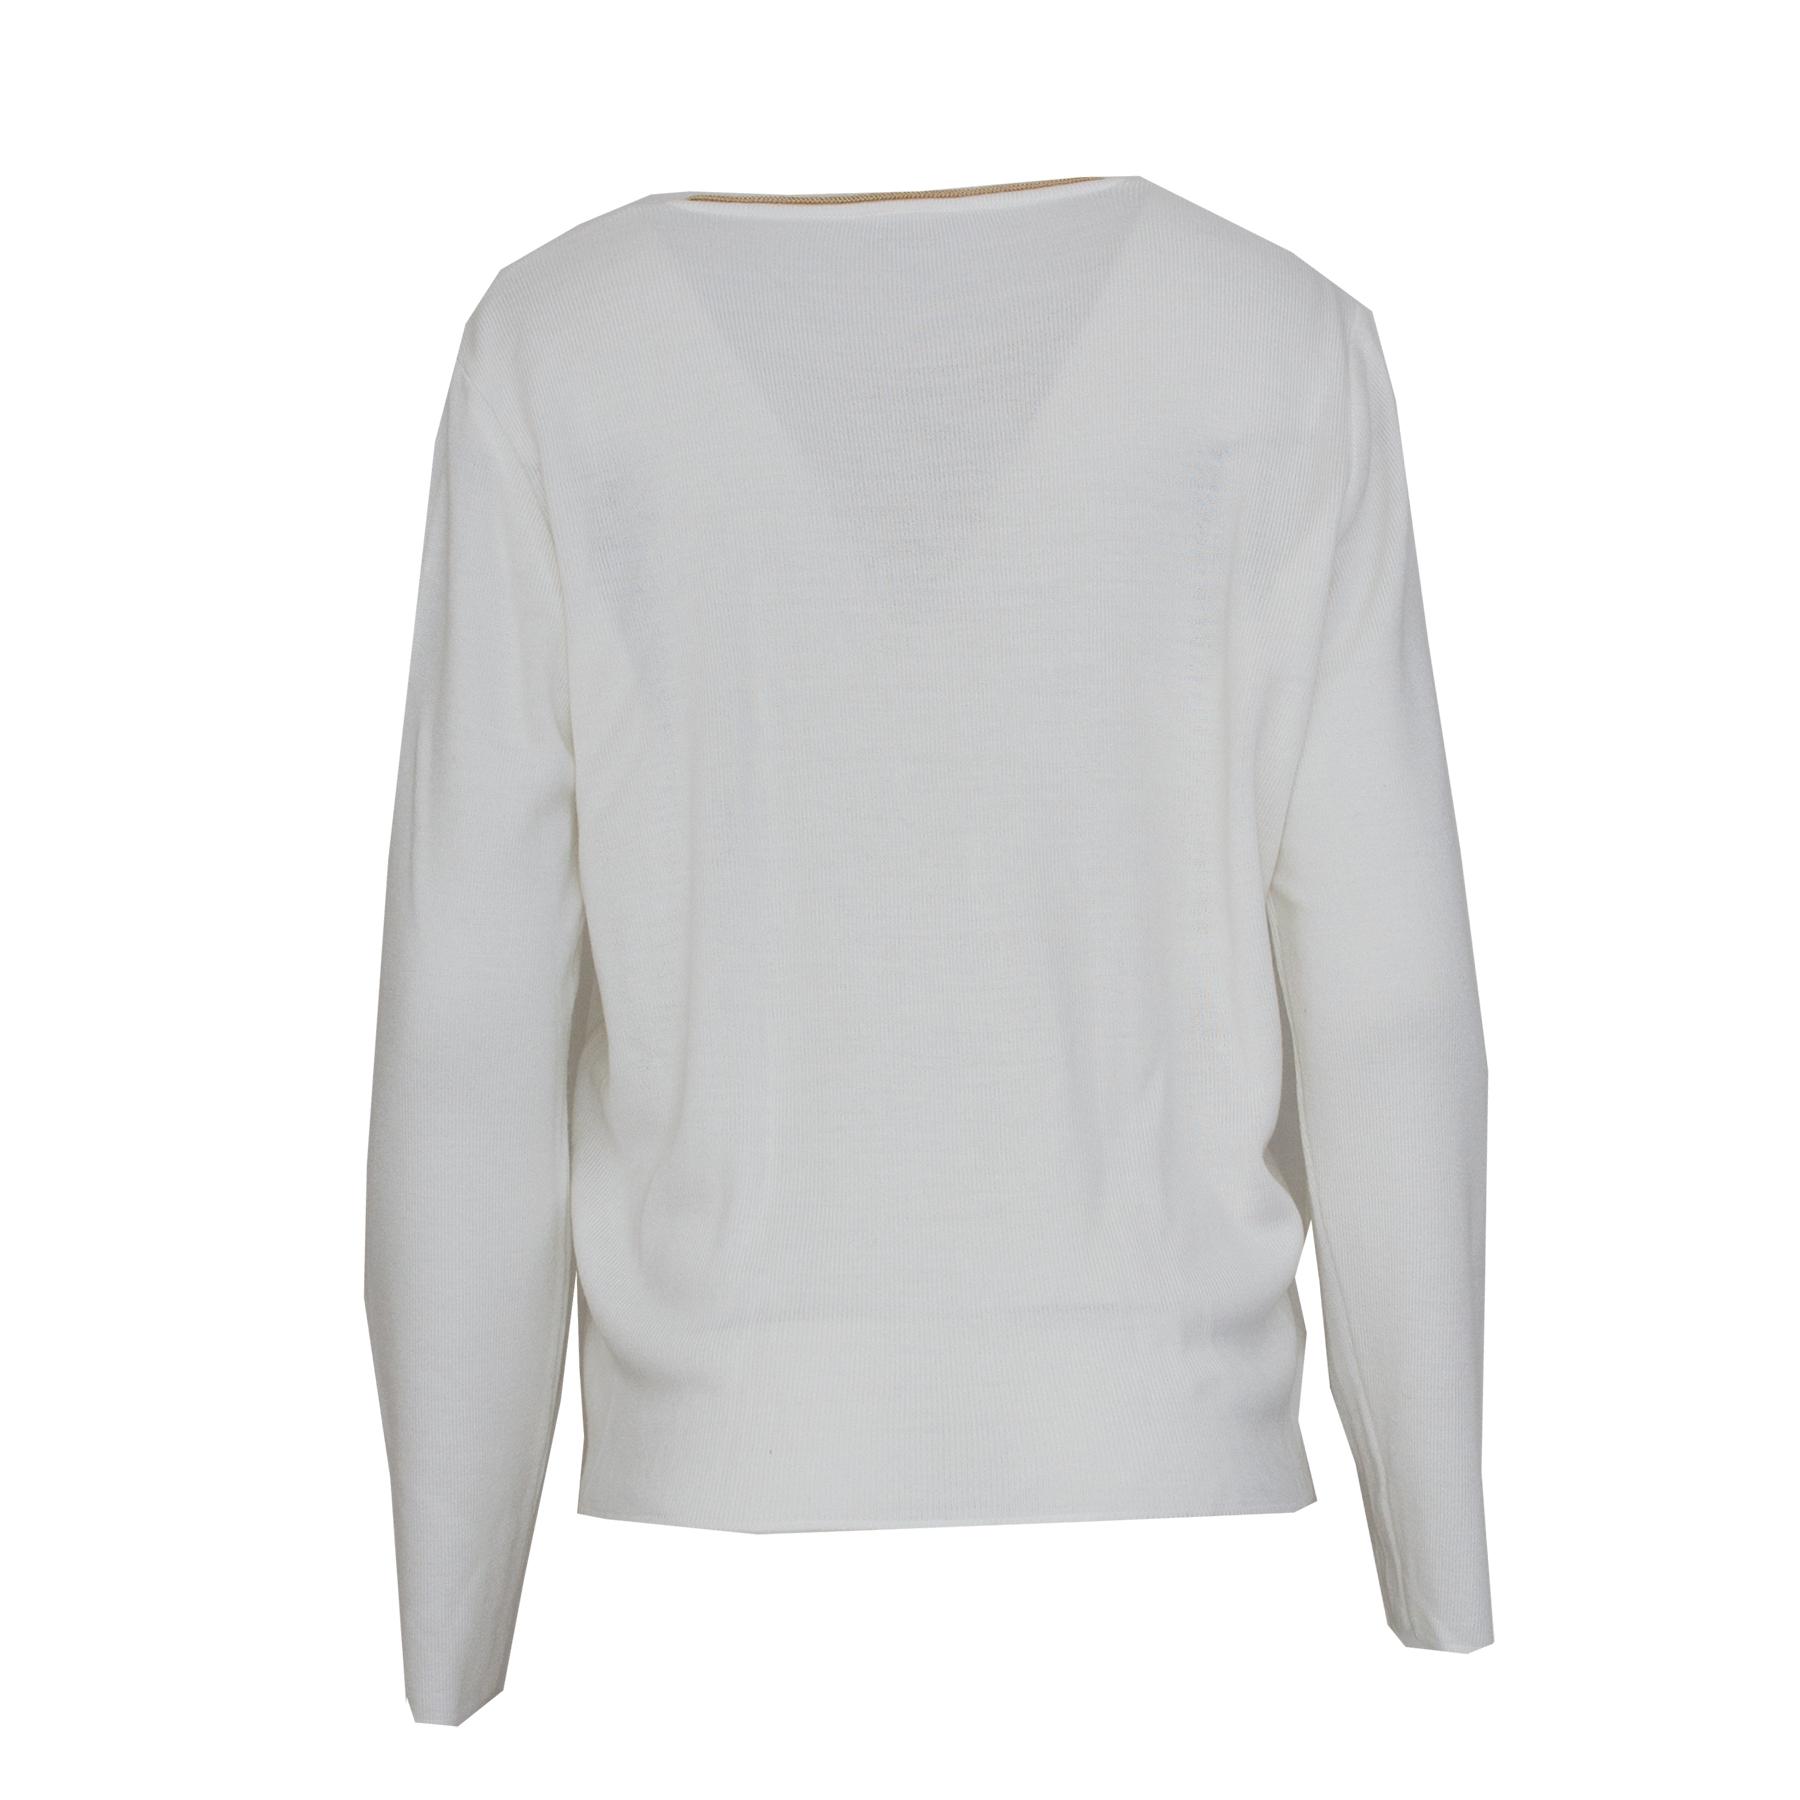 Lucia, valkoinen neuletakki - M/L